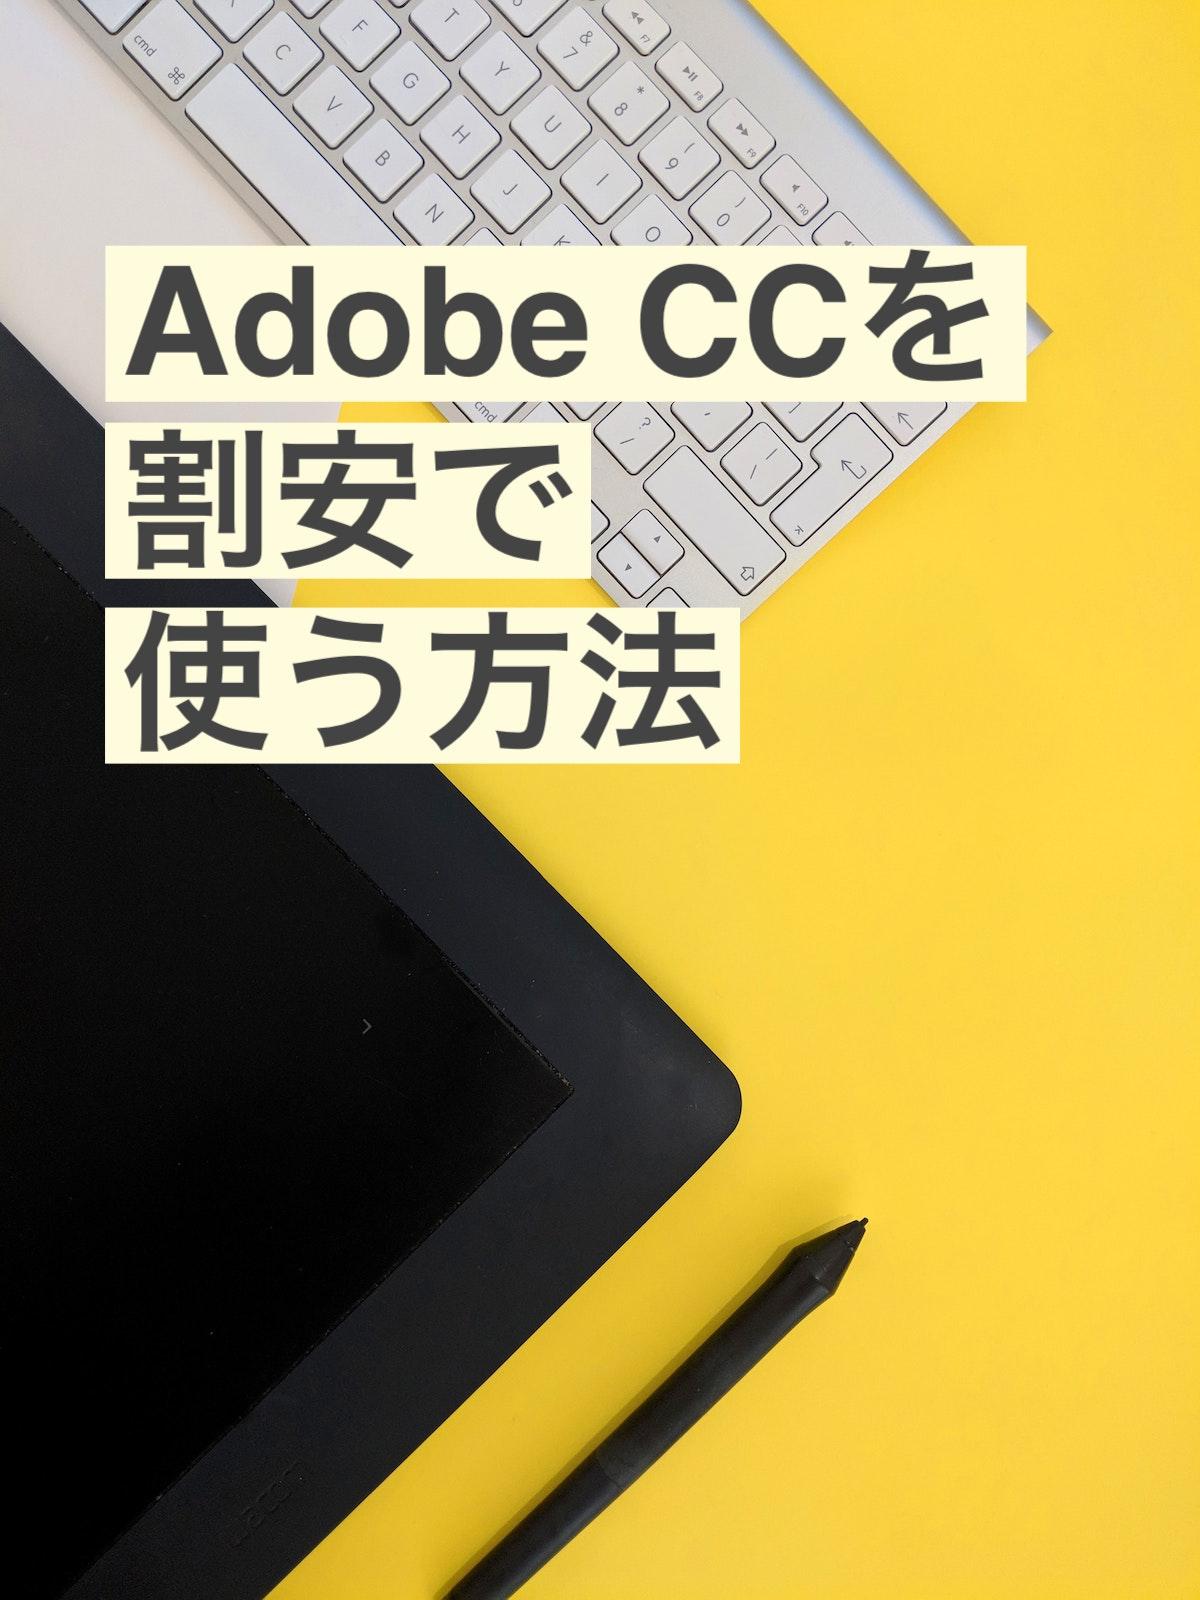 AdobeCCを割安で使う方法